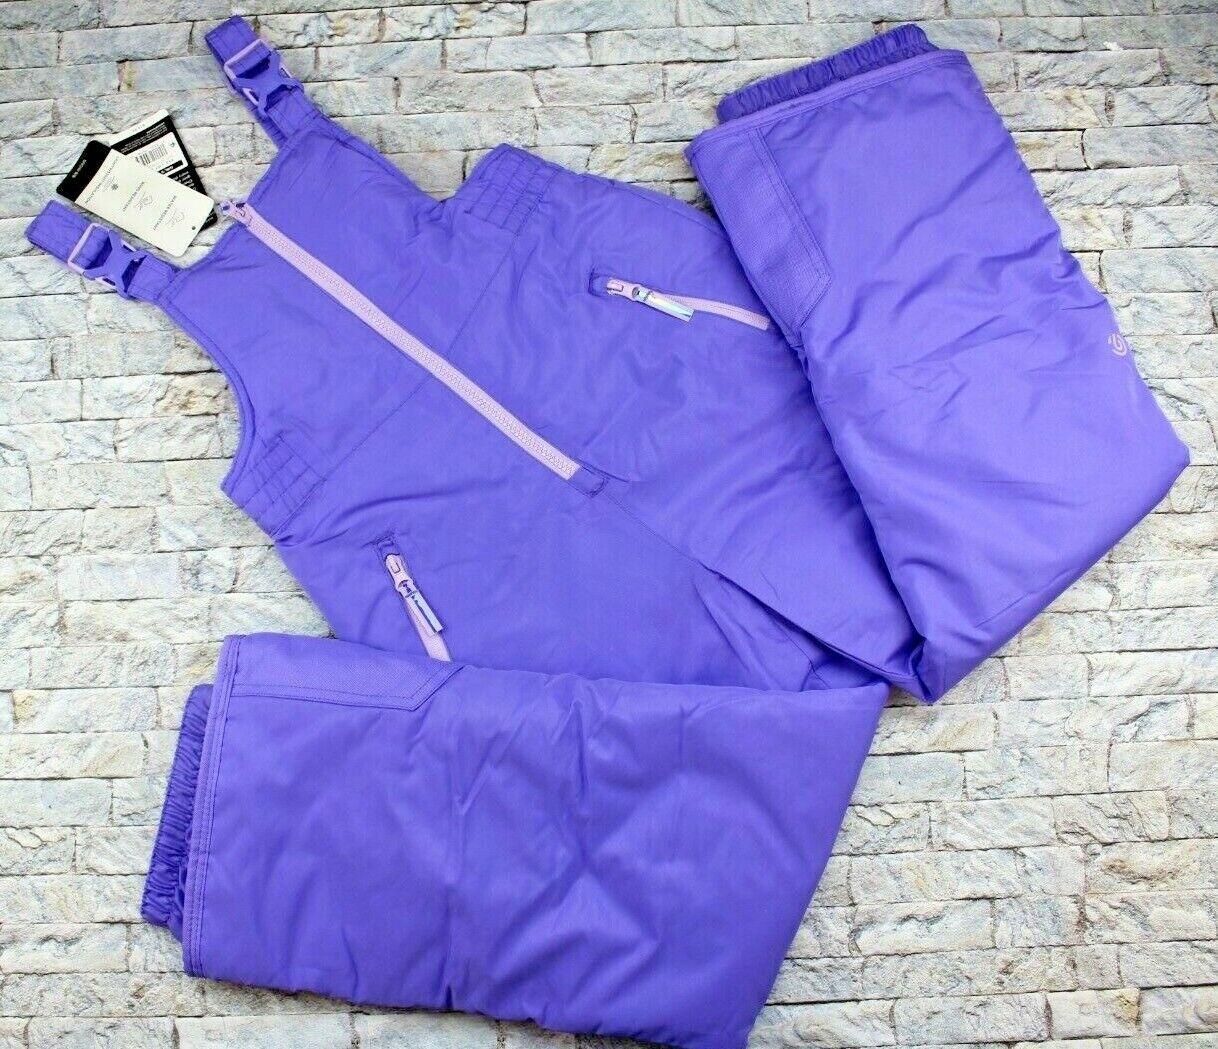 Girls Snow Suit Bib Pants  M 7/8 Champion C9 Purple Overalls